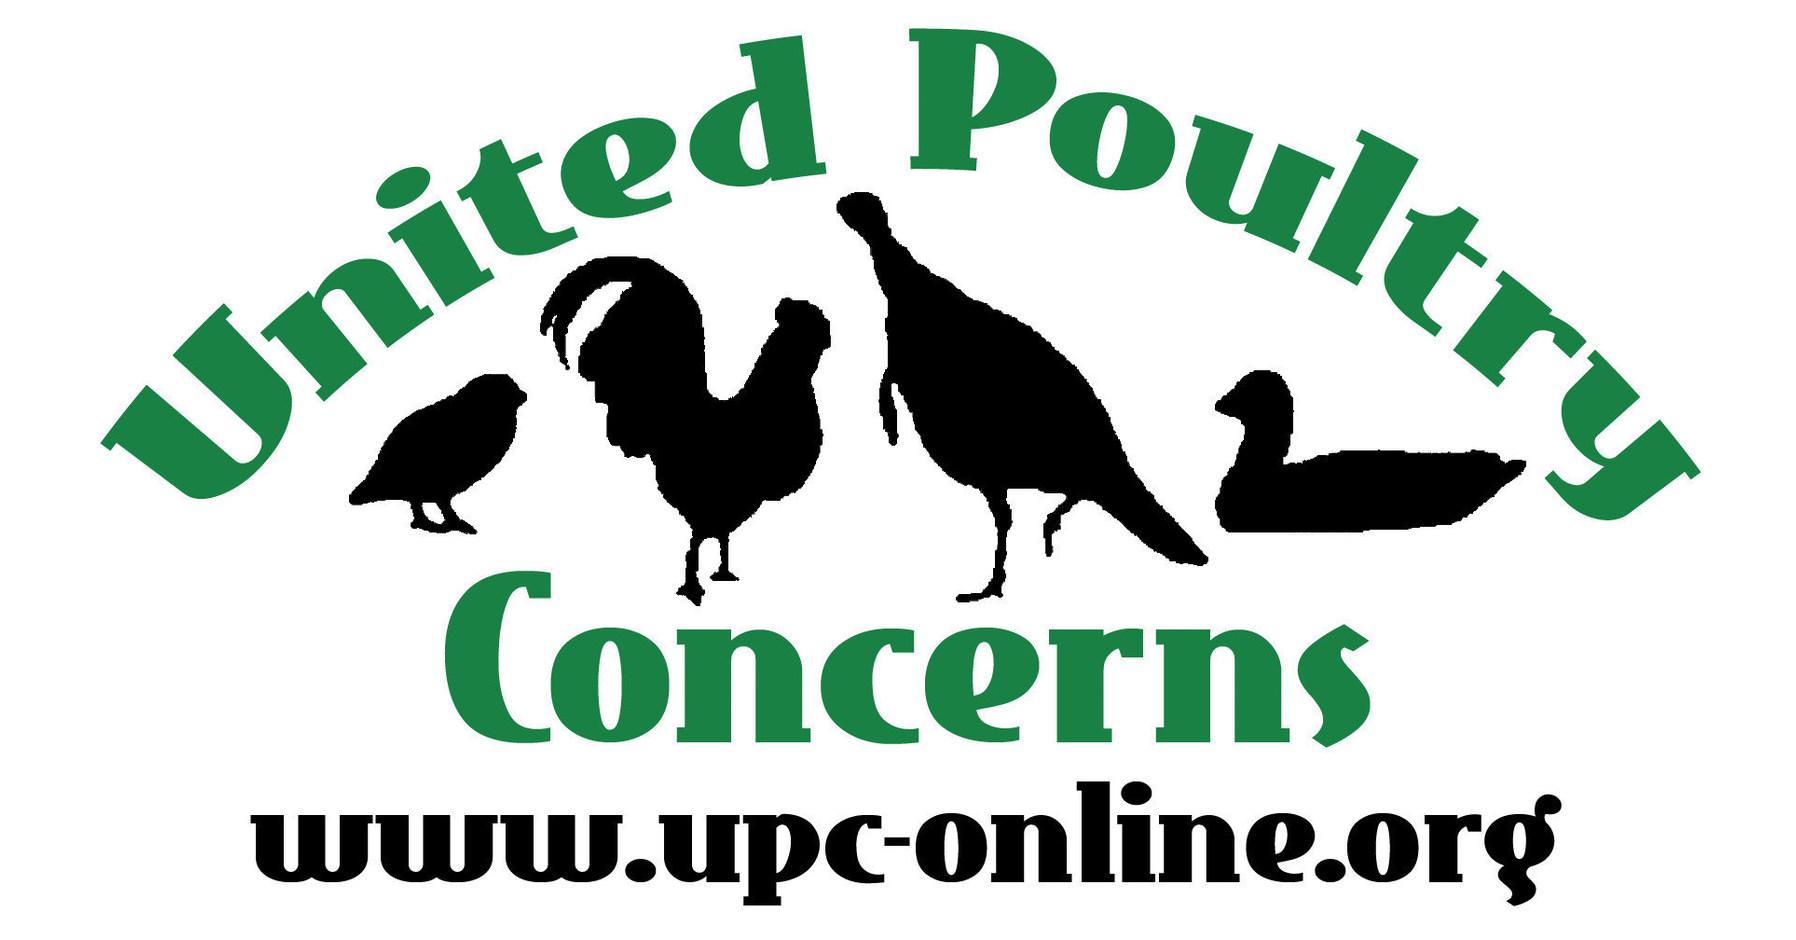 United Poultry Concerns Issues Statement Regarding Jason Alexander's Sponsorship of KFC